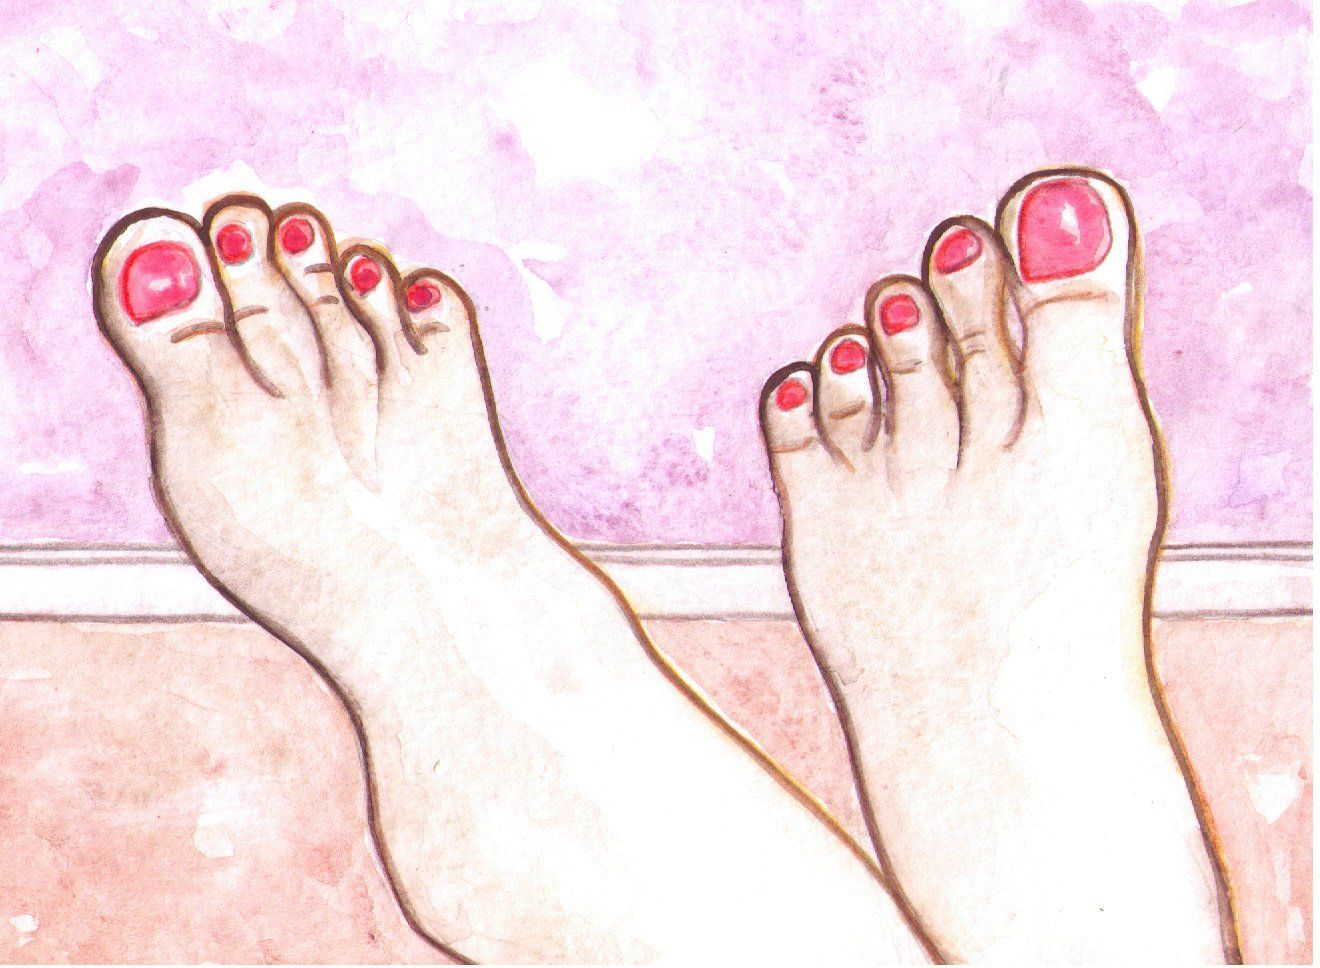 Feet Art Painting Foot Painted Pink Red Toenails Original